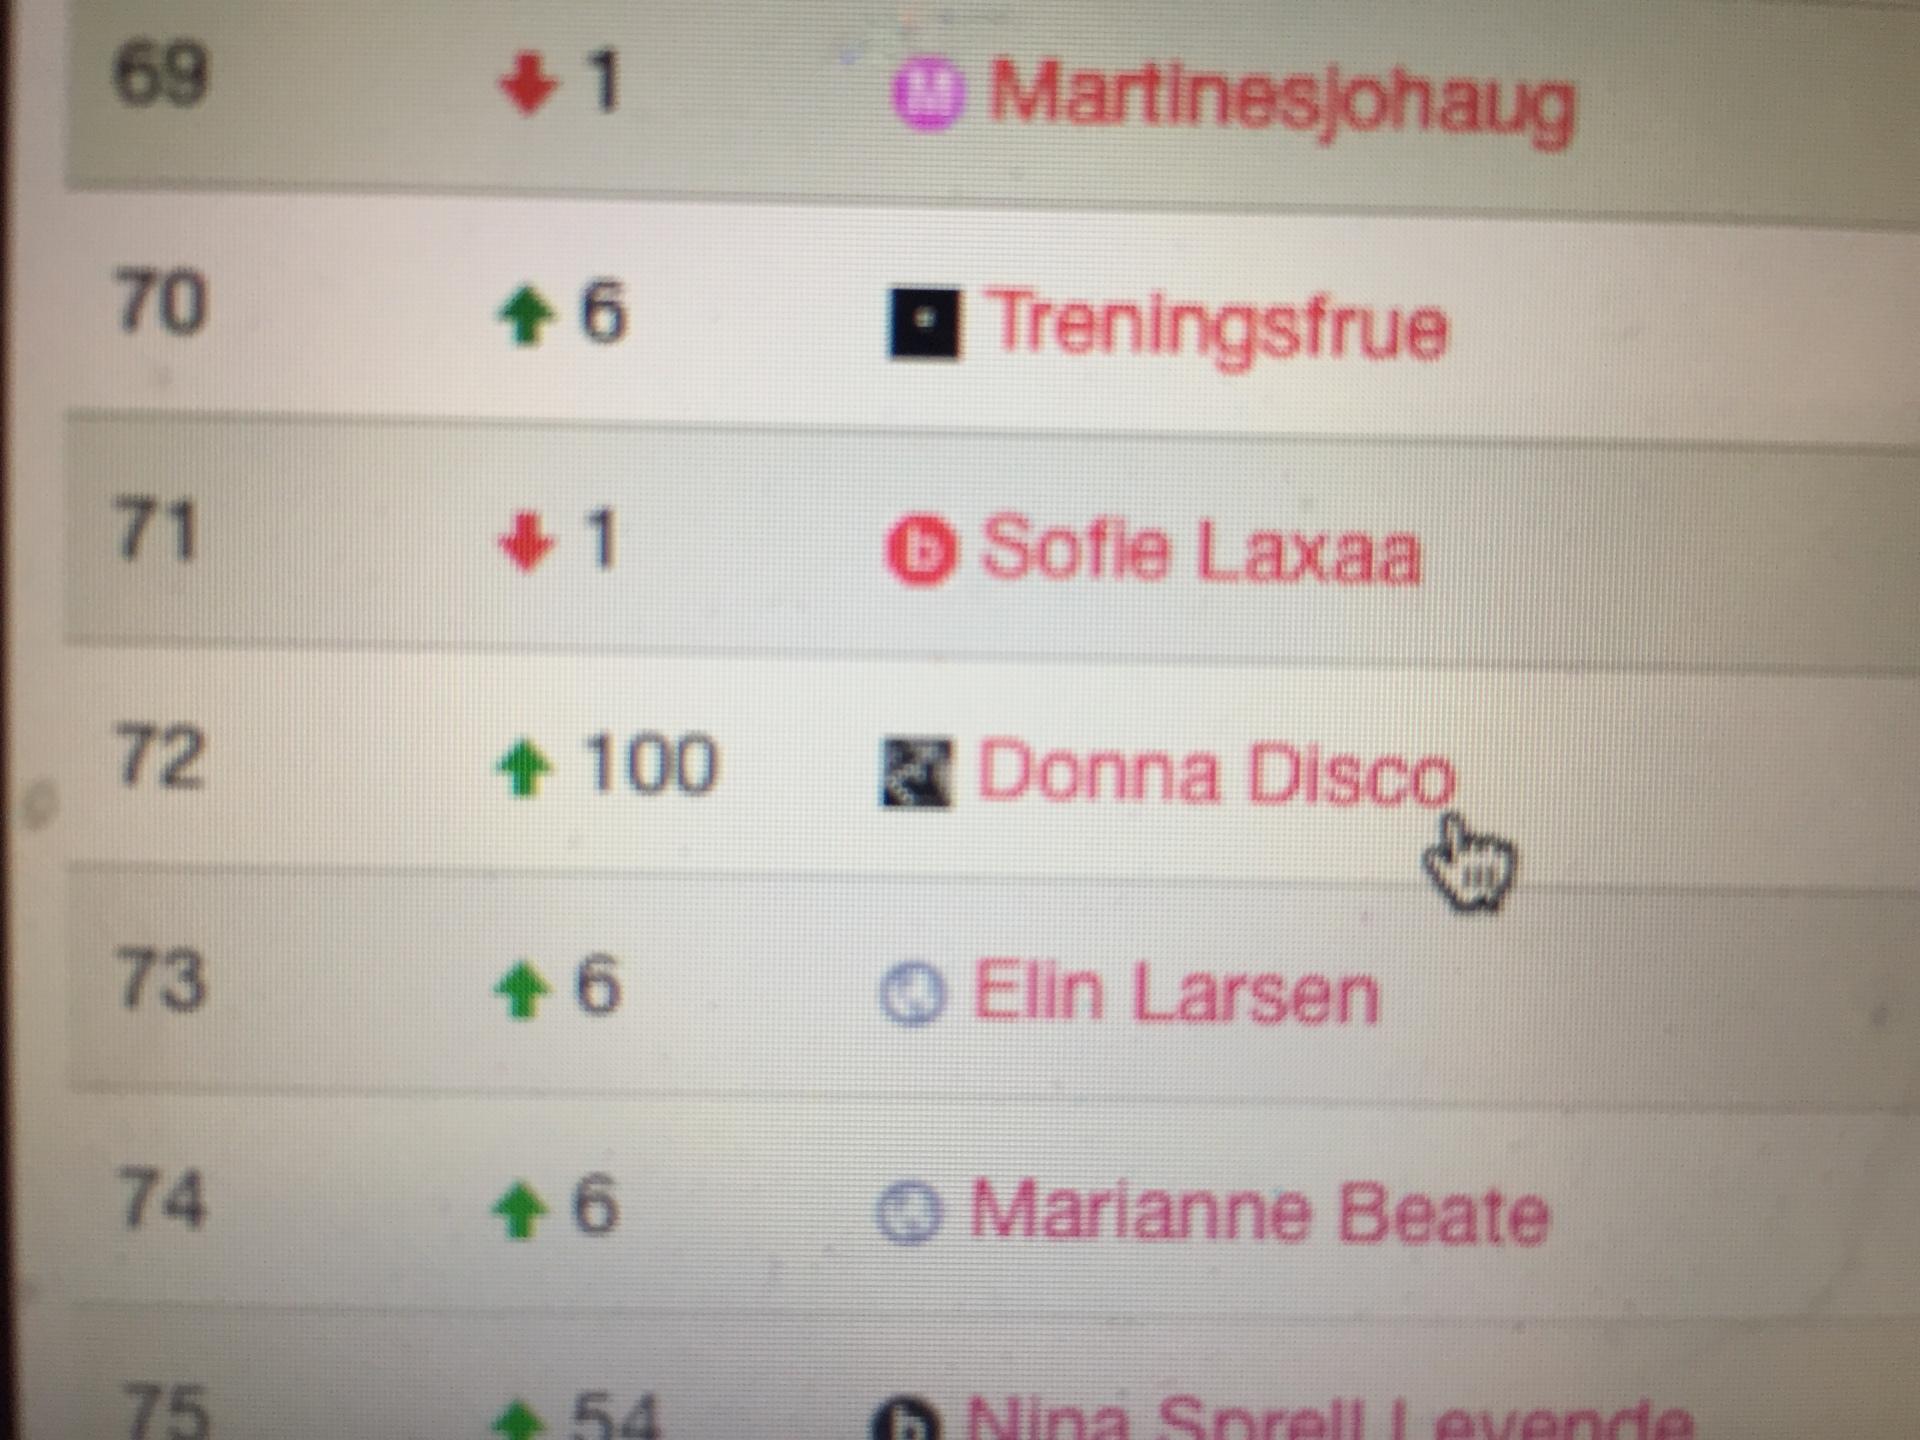 Blogglisten.no Donna Disco på 72. plass